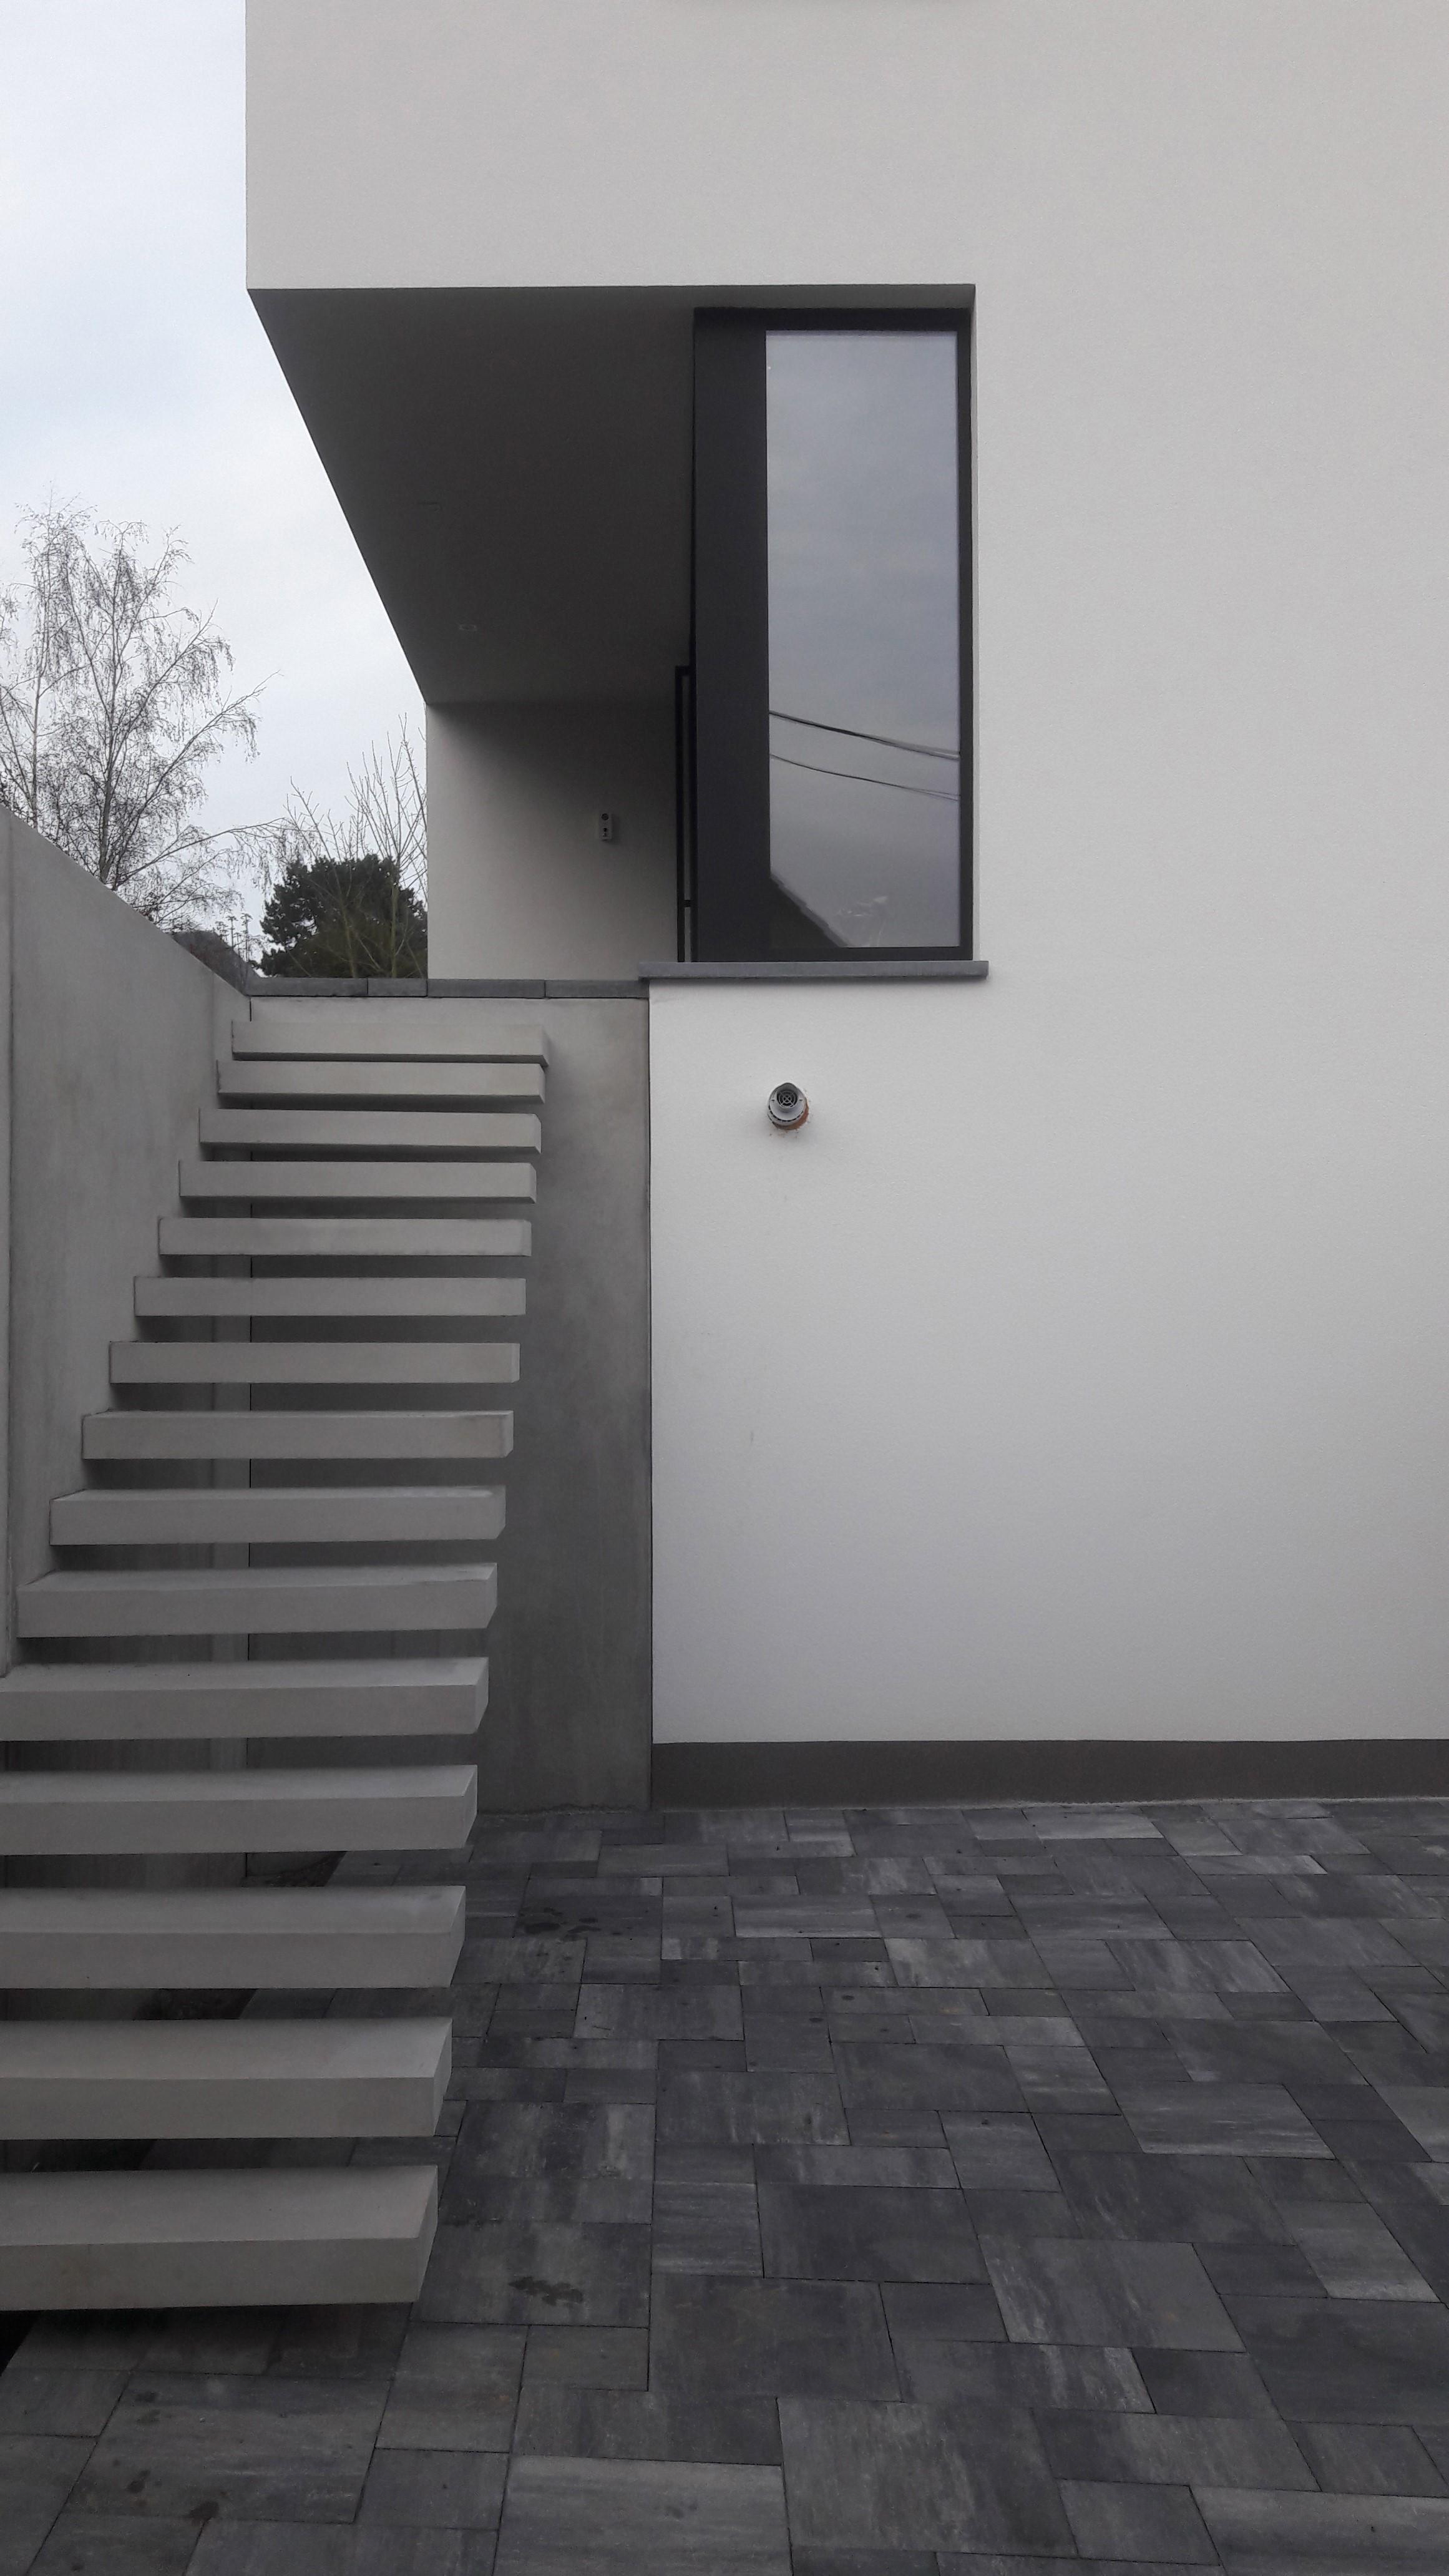 Zwevende trap beton elegant nous essaierons toujours for Looplijn trap